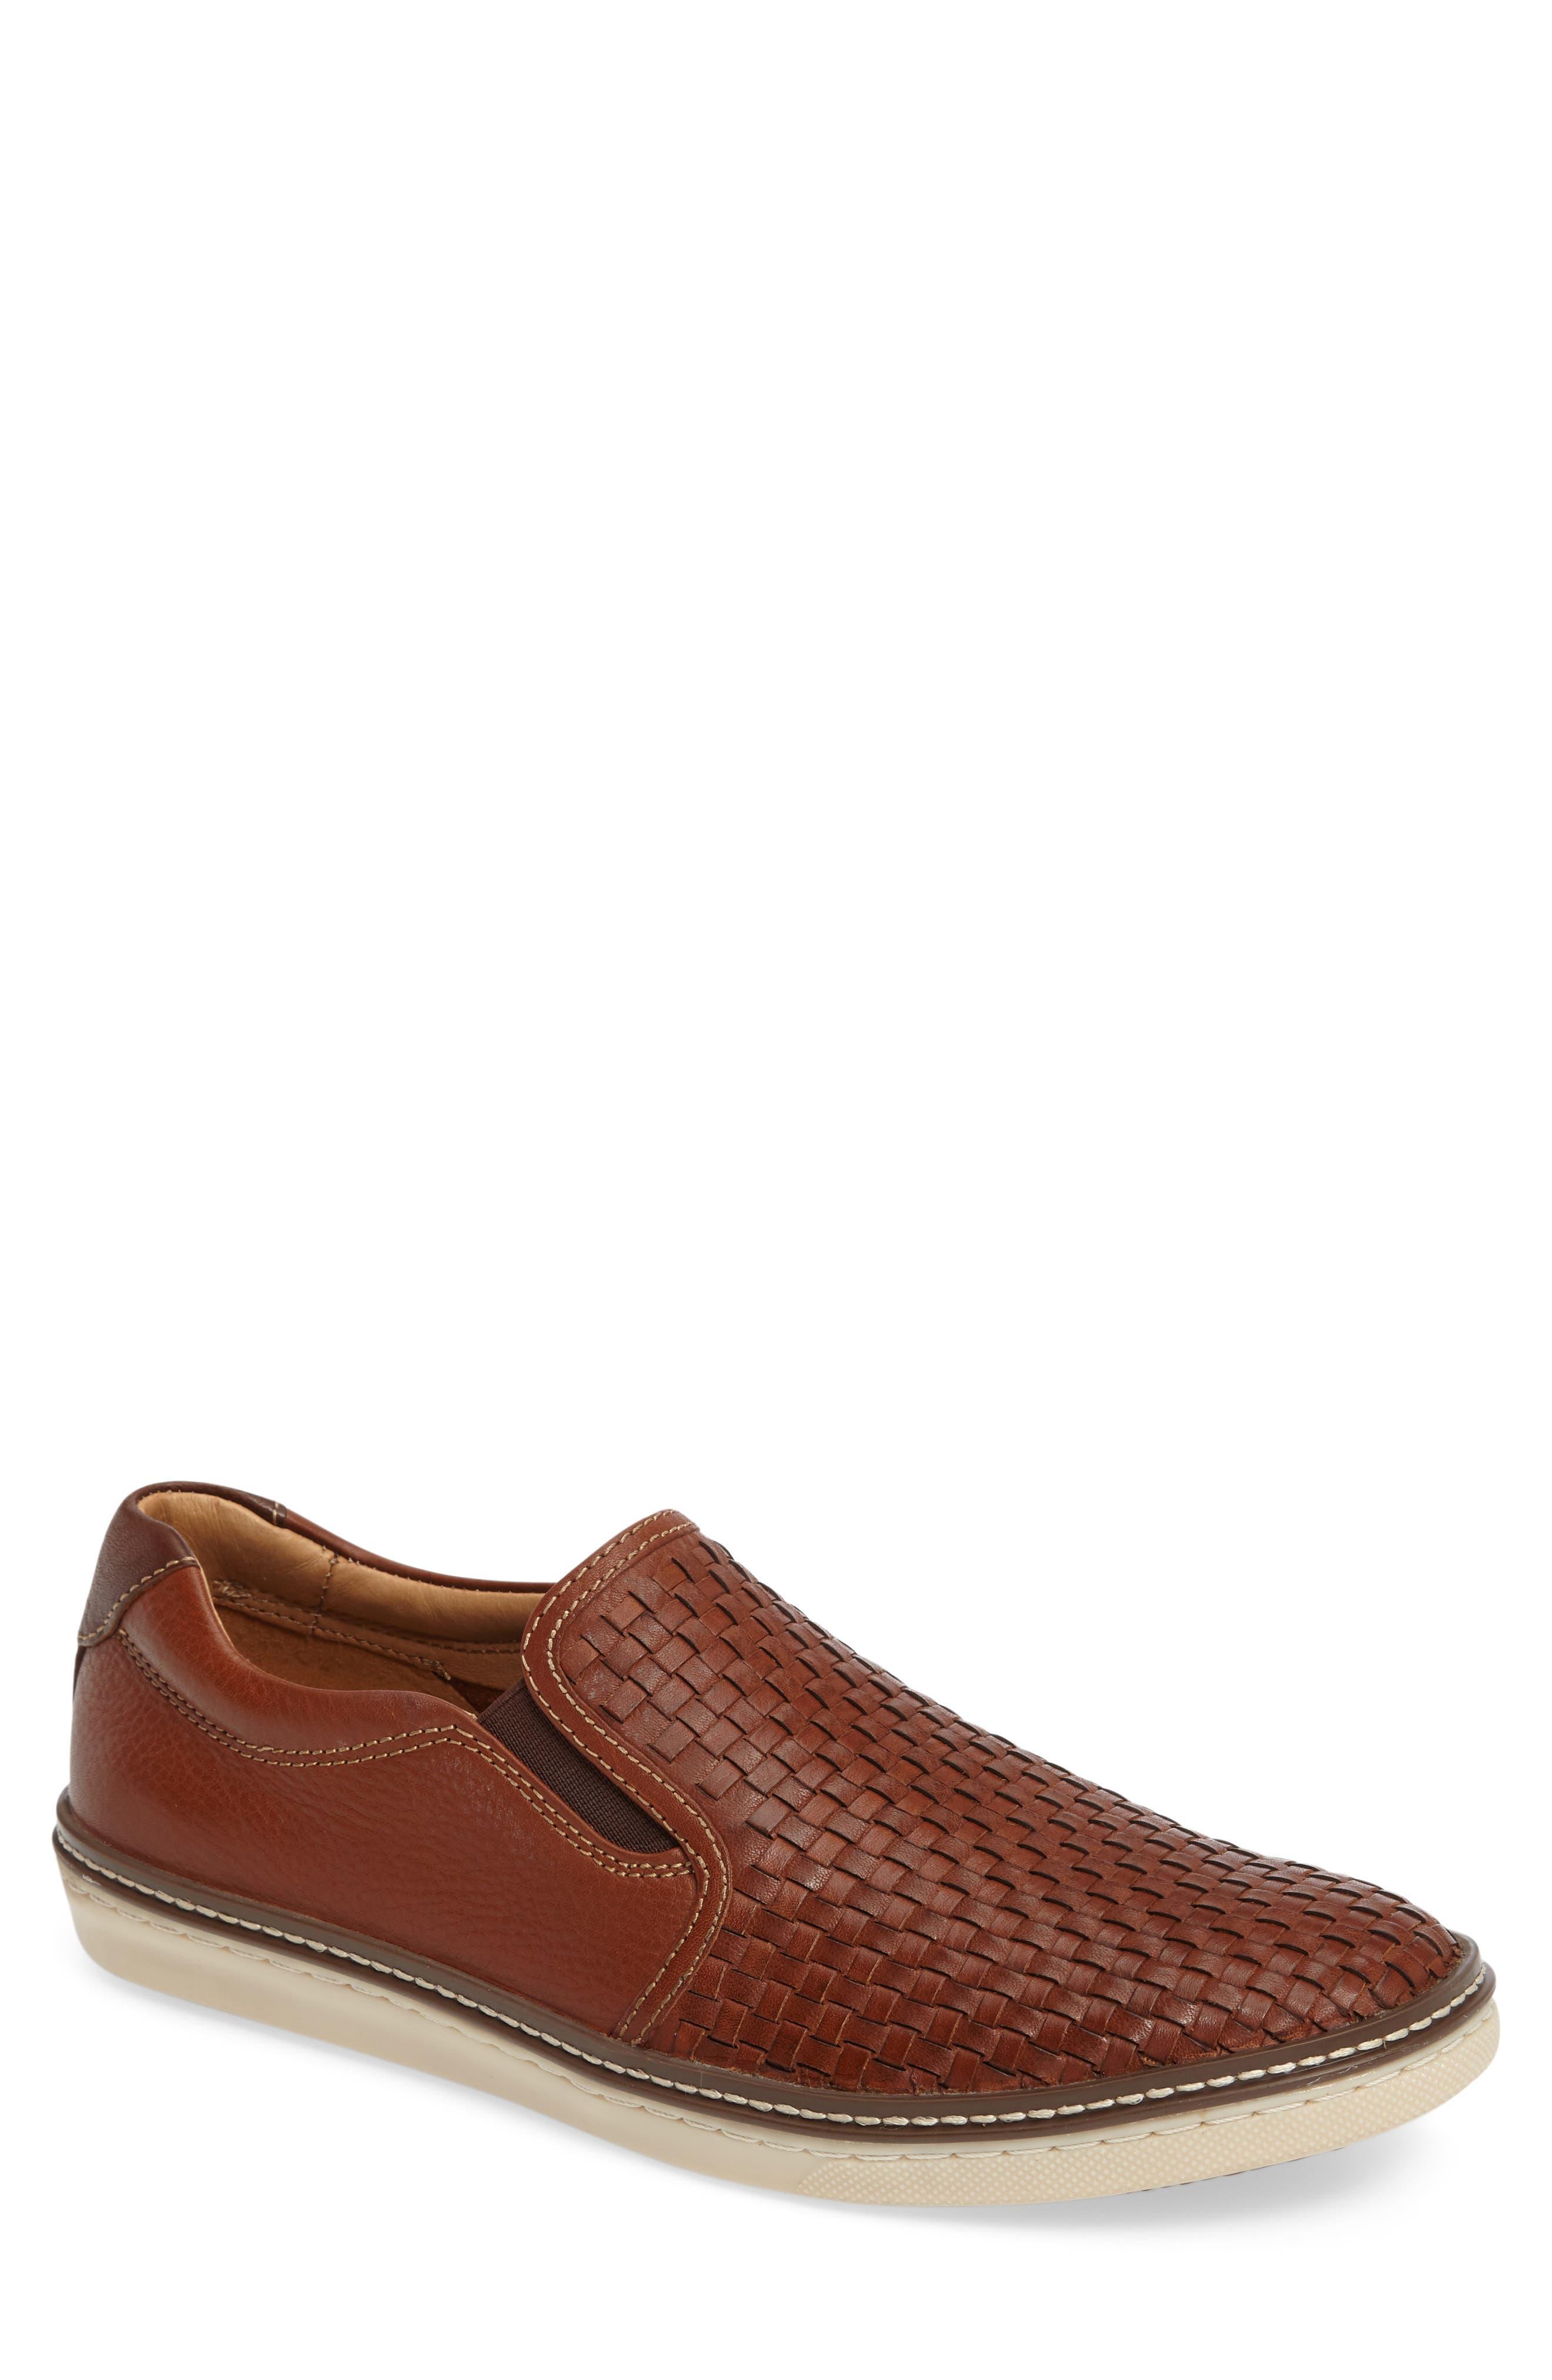 McGuffey Woven Slip-On Sneaker,                         Main,                         color, Tan Leather